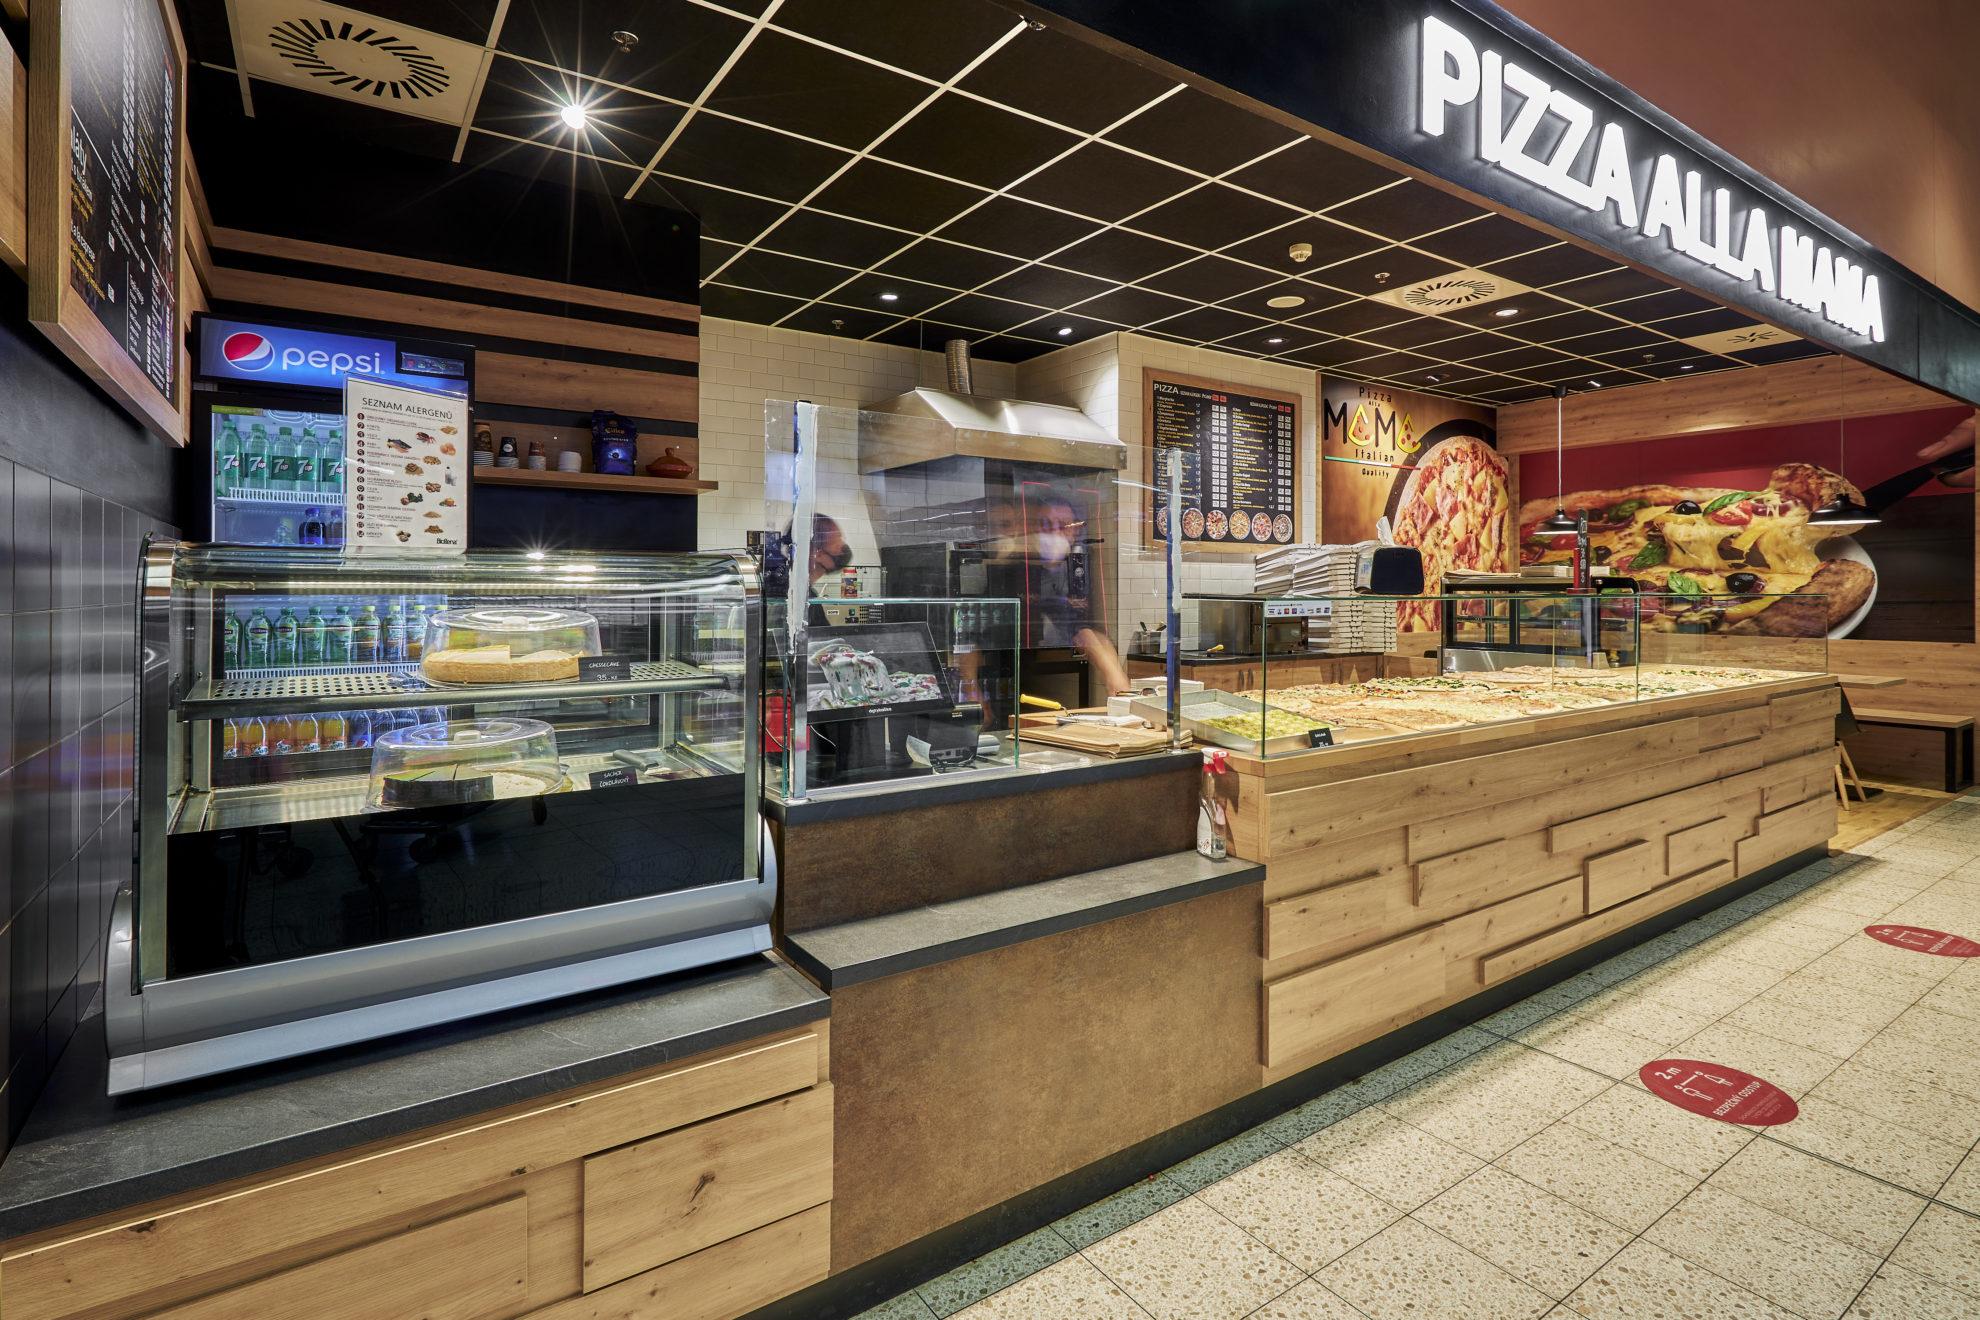 FESCHU Pizza Alla Mama OC Kaufland Melnik celkovy pohled vitriny